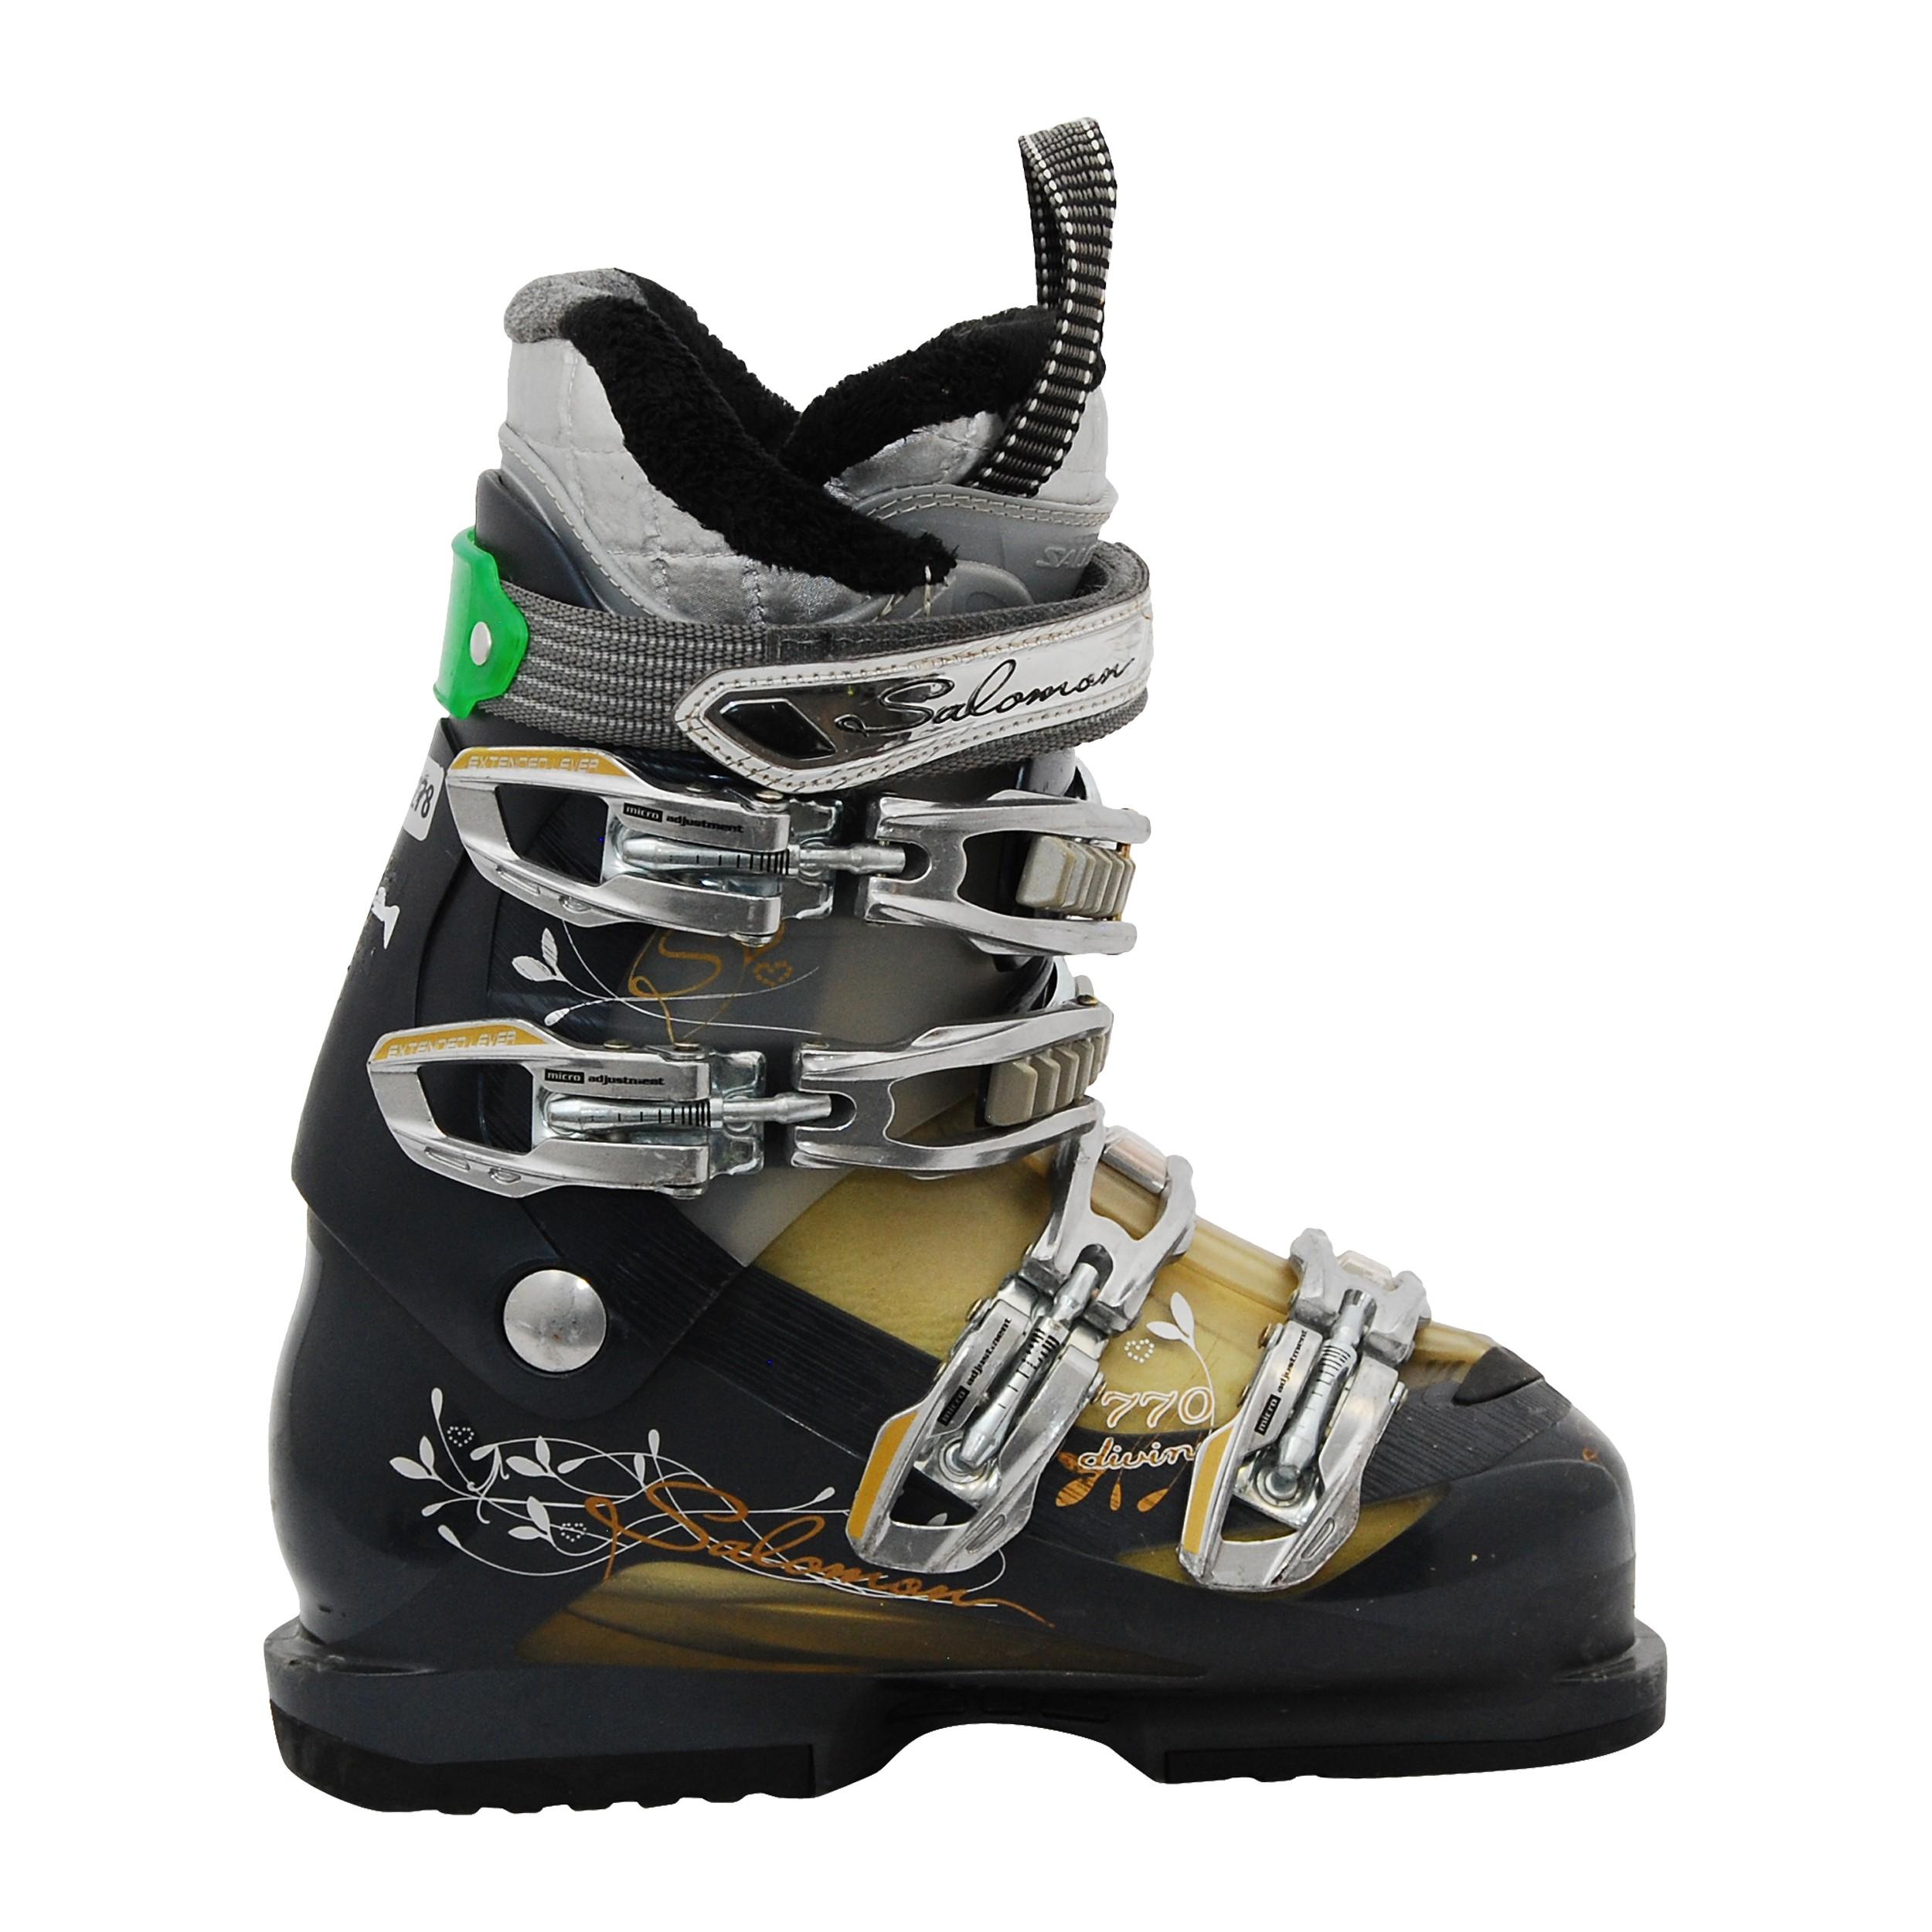 Chaussure de ski occasion femme Salomon Divine 770 beigenoir vi8GK